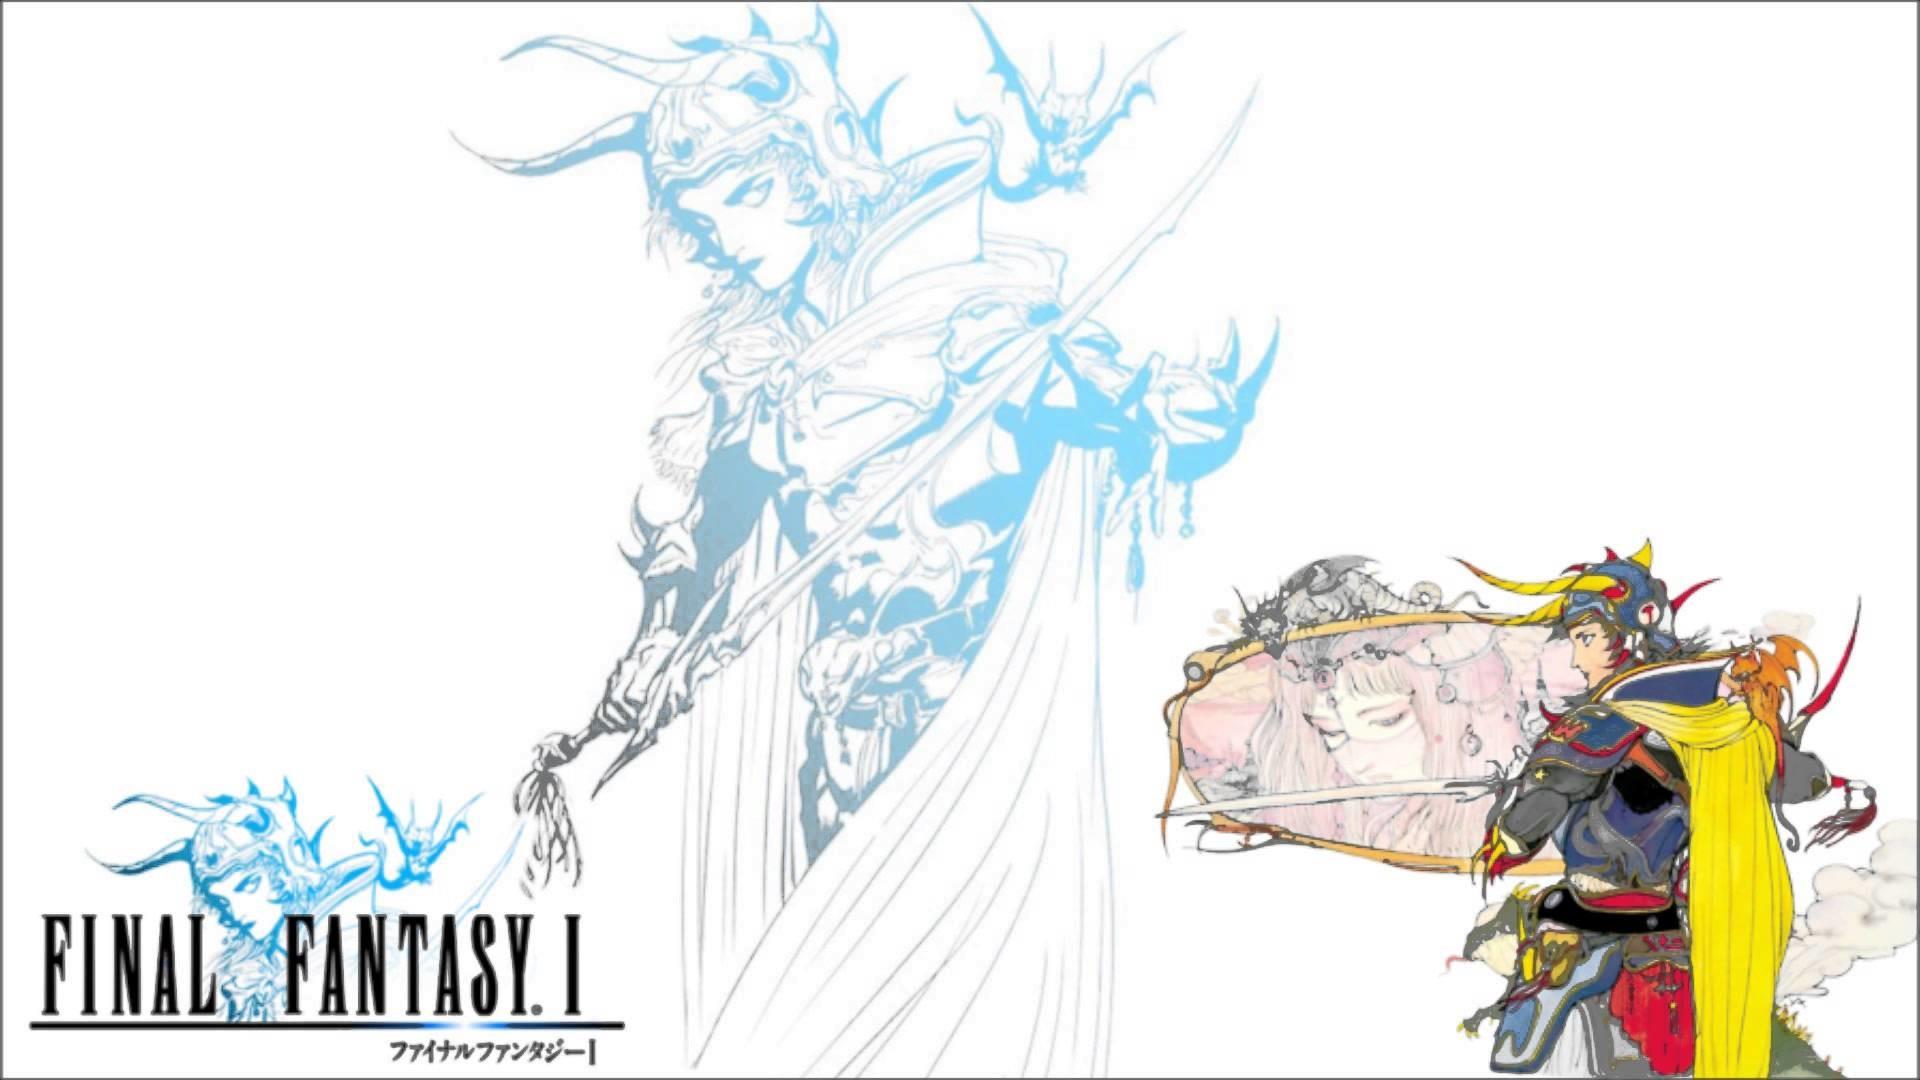 2932x2932 Tifa Lockhart Final Fantasy Artwork Ipad Pro: Final Fantasy 1 Wallpaper (75+ Images